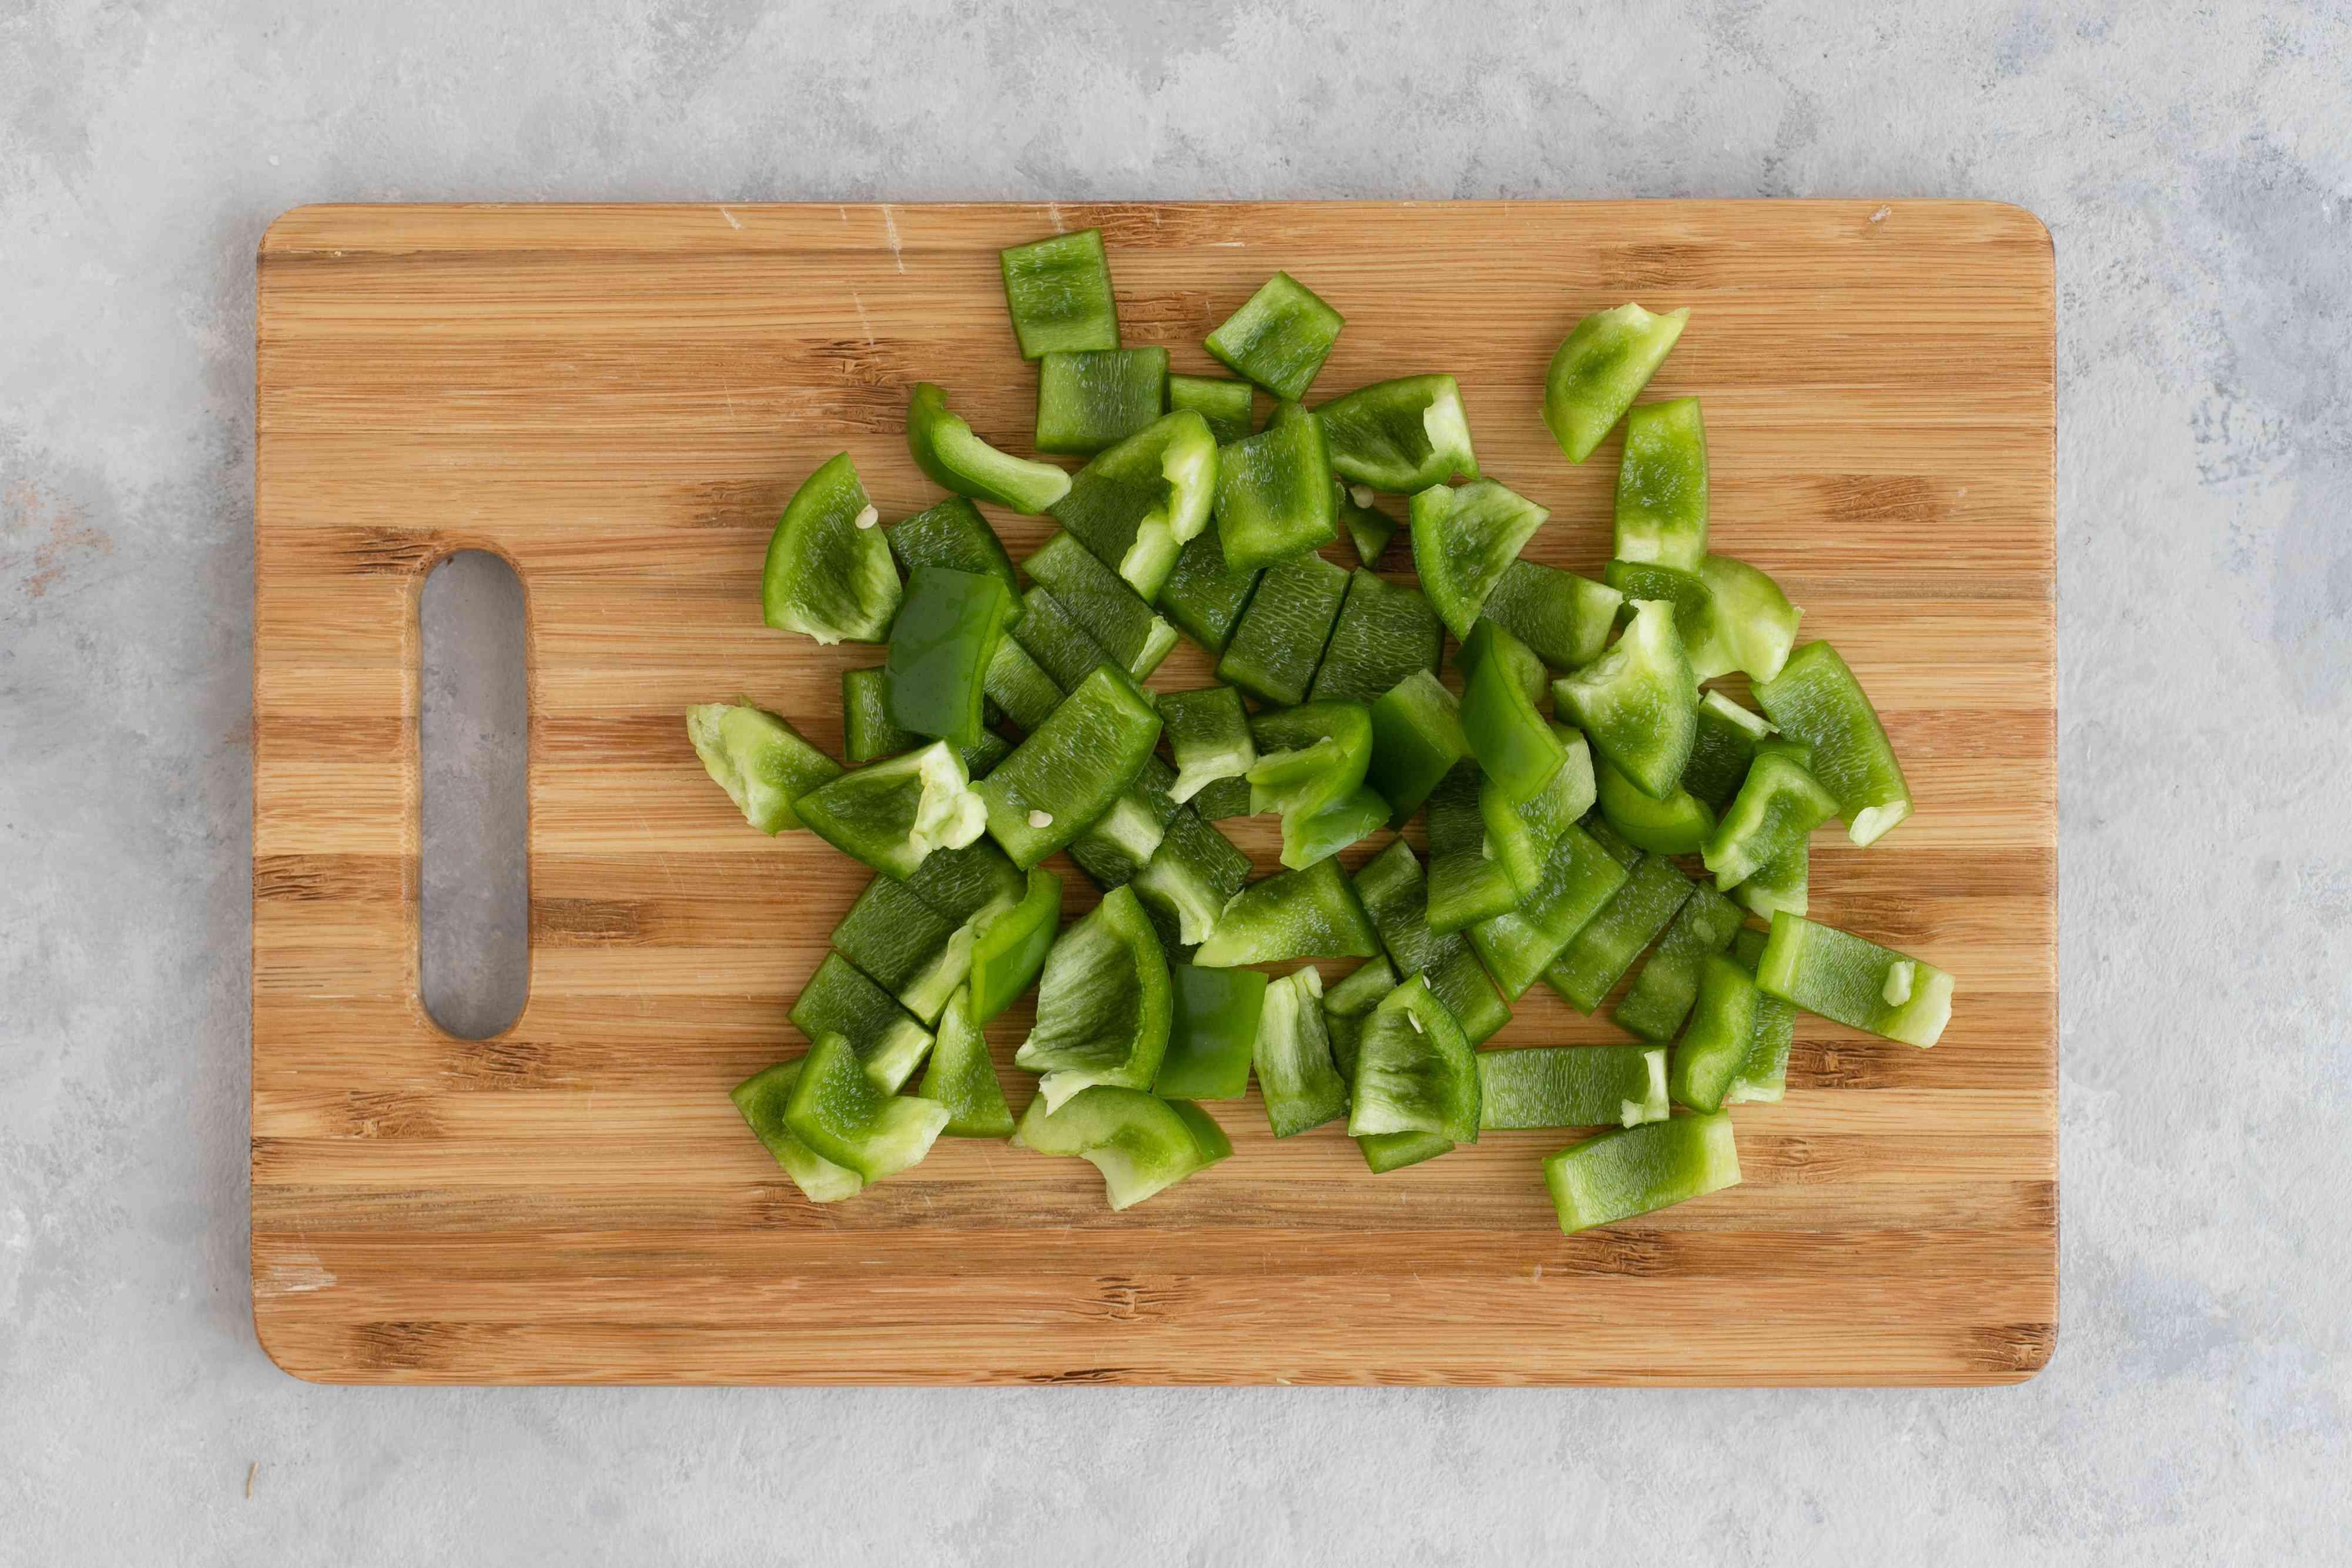 Diced bell pepper